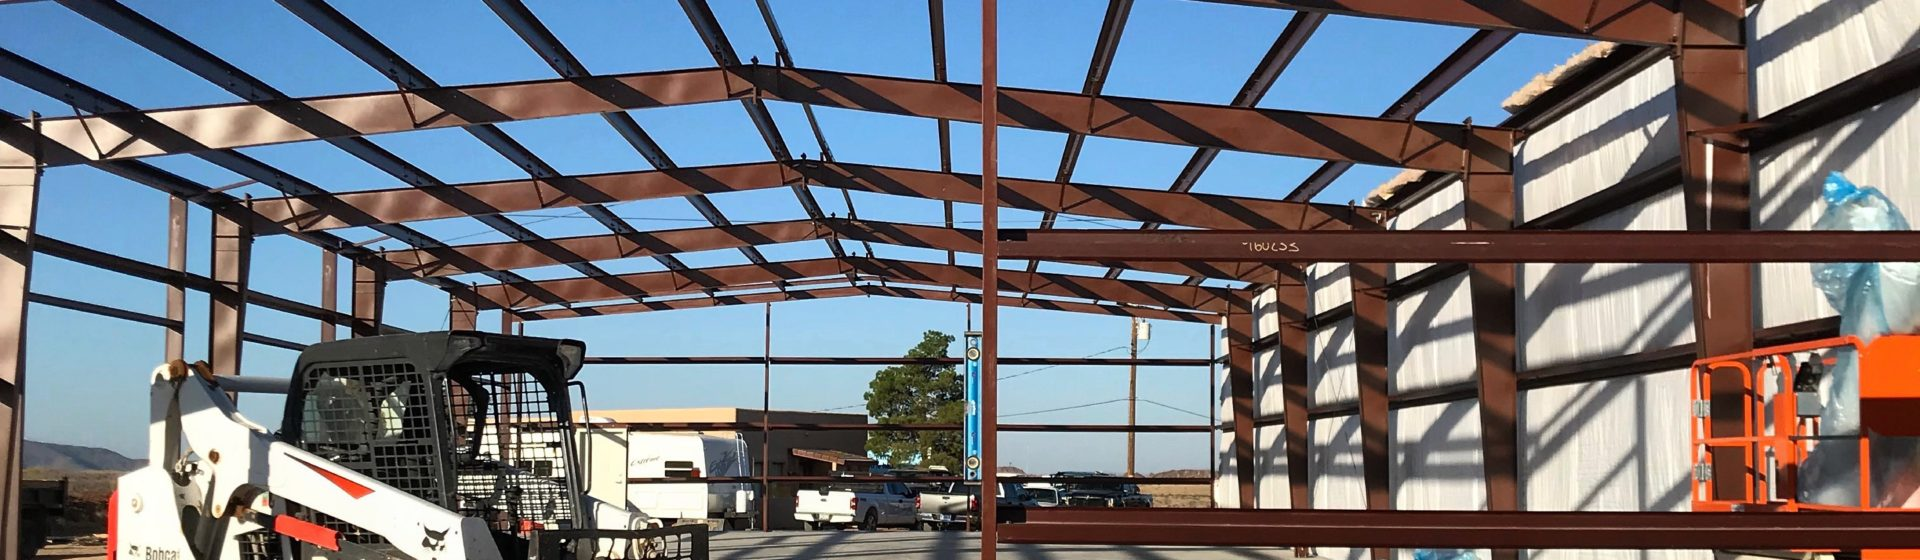 Metal building frame   Bunger Steel